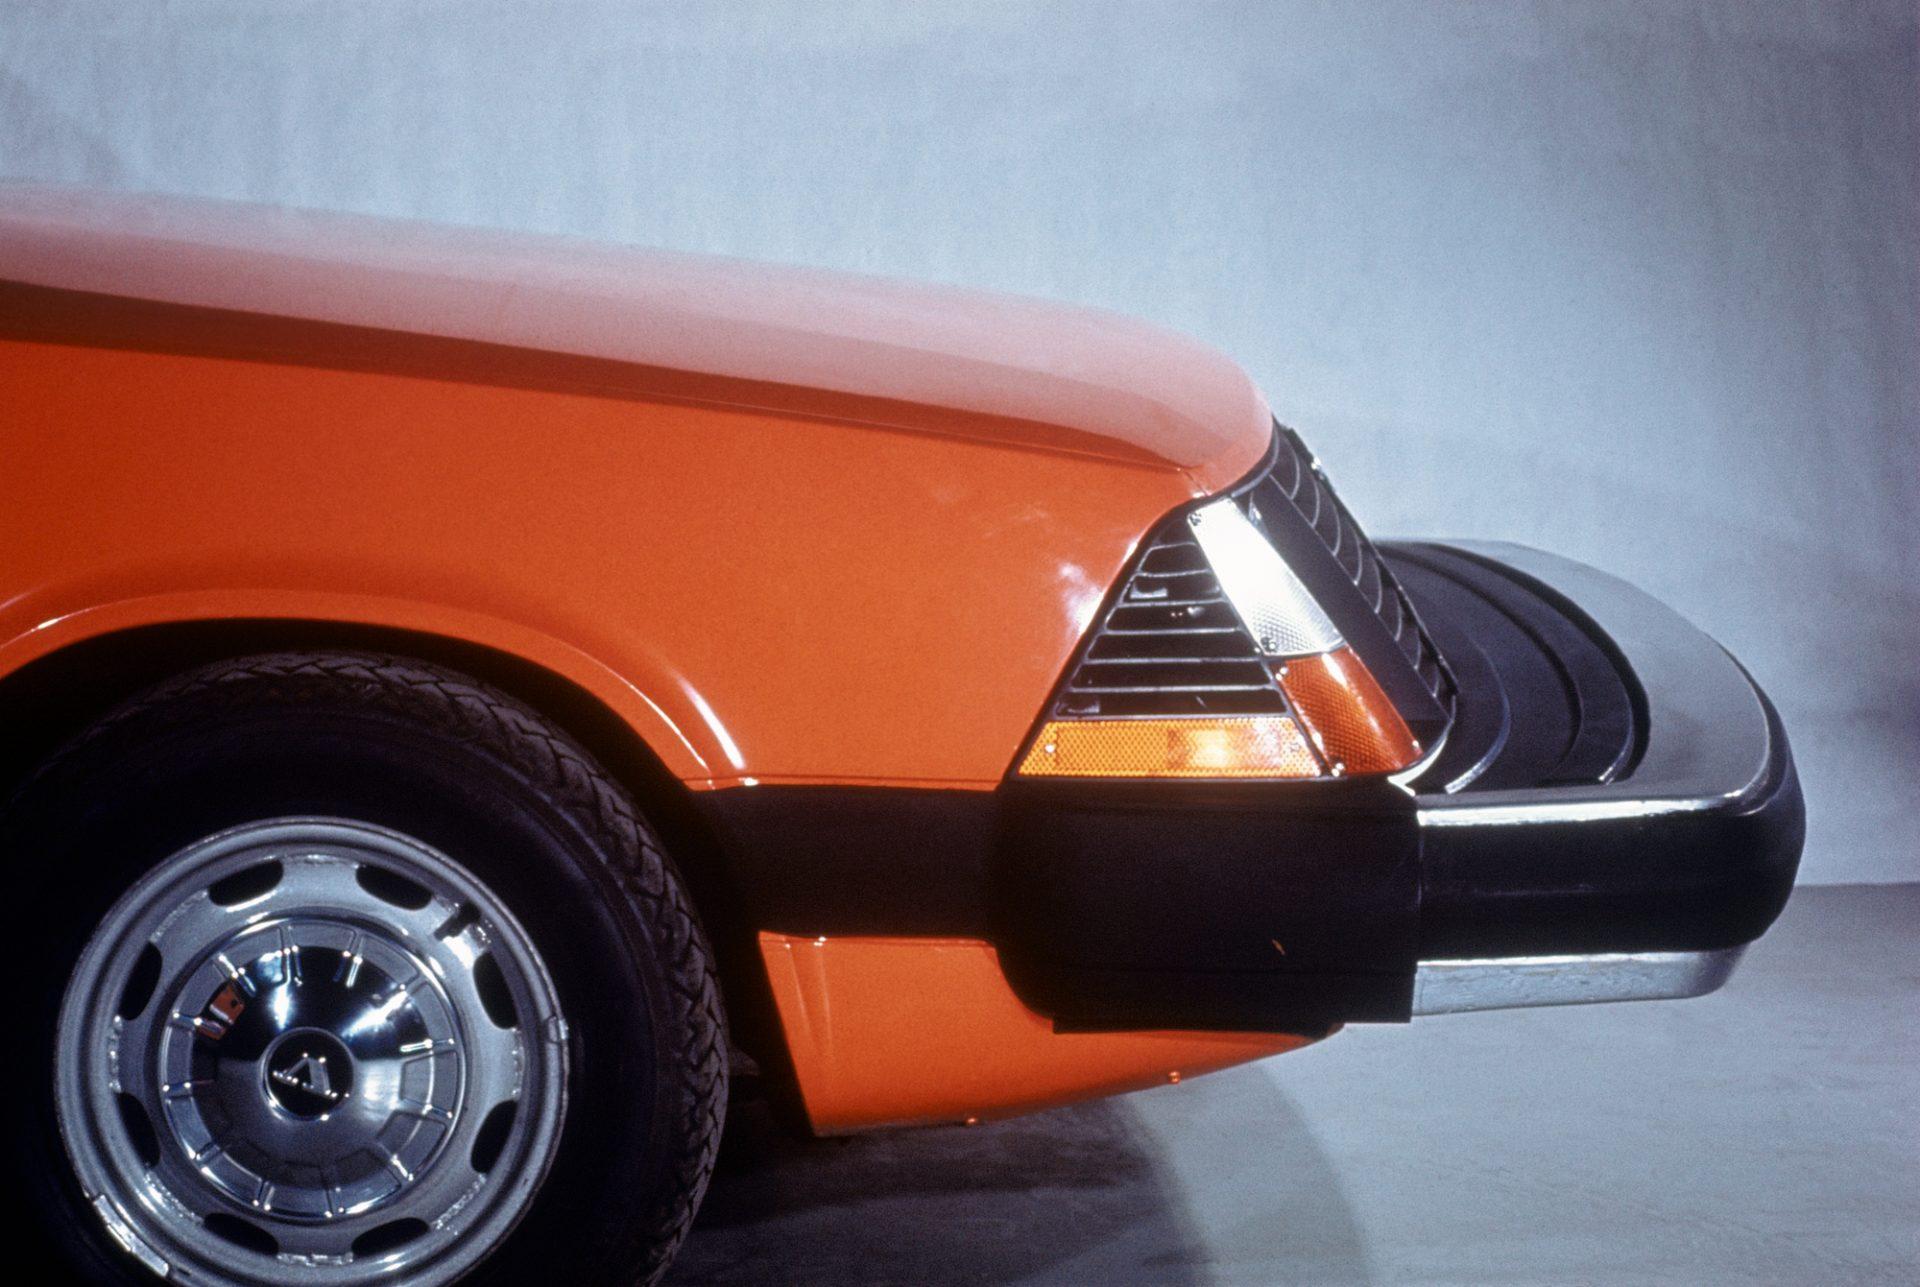 Volvo_VESC_Concept_Car_20549